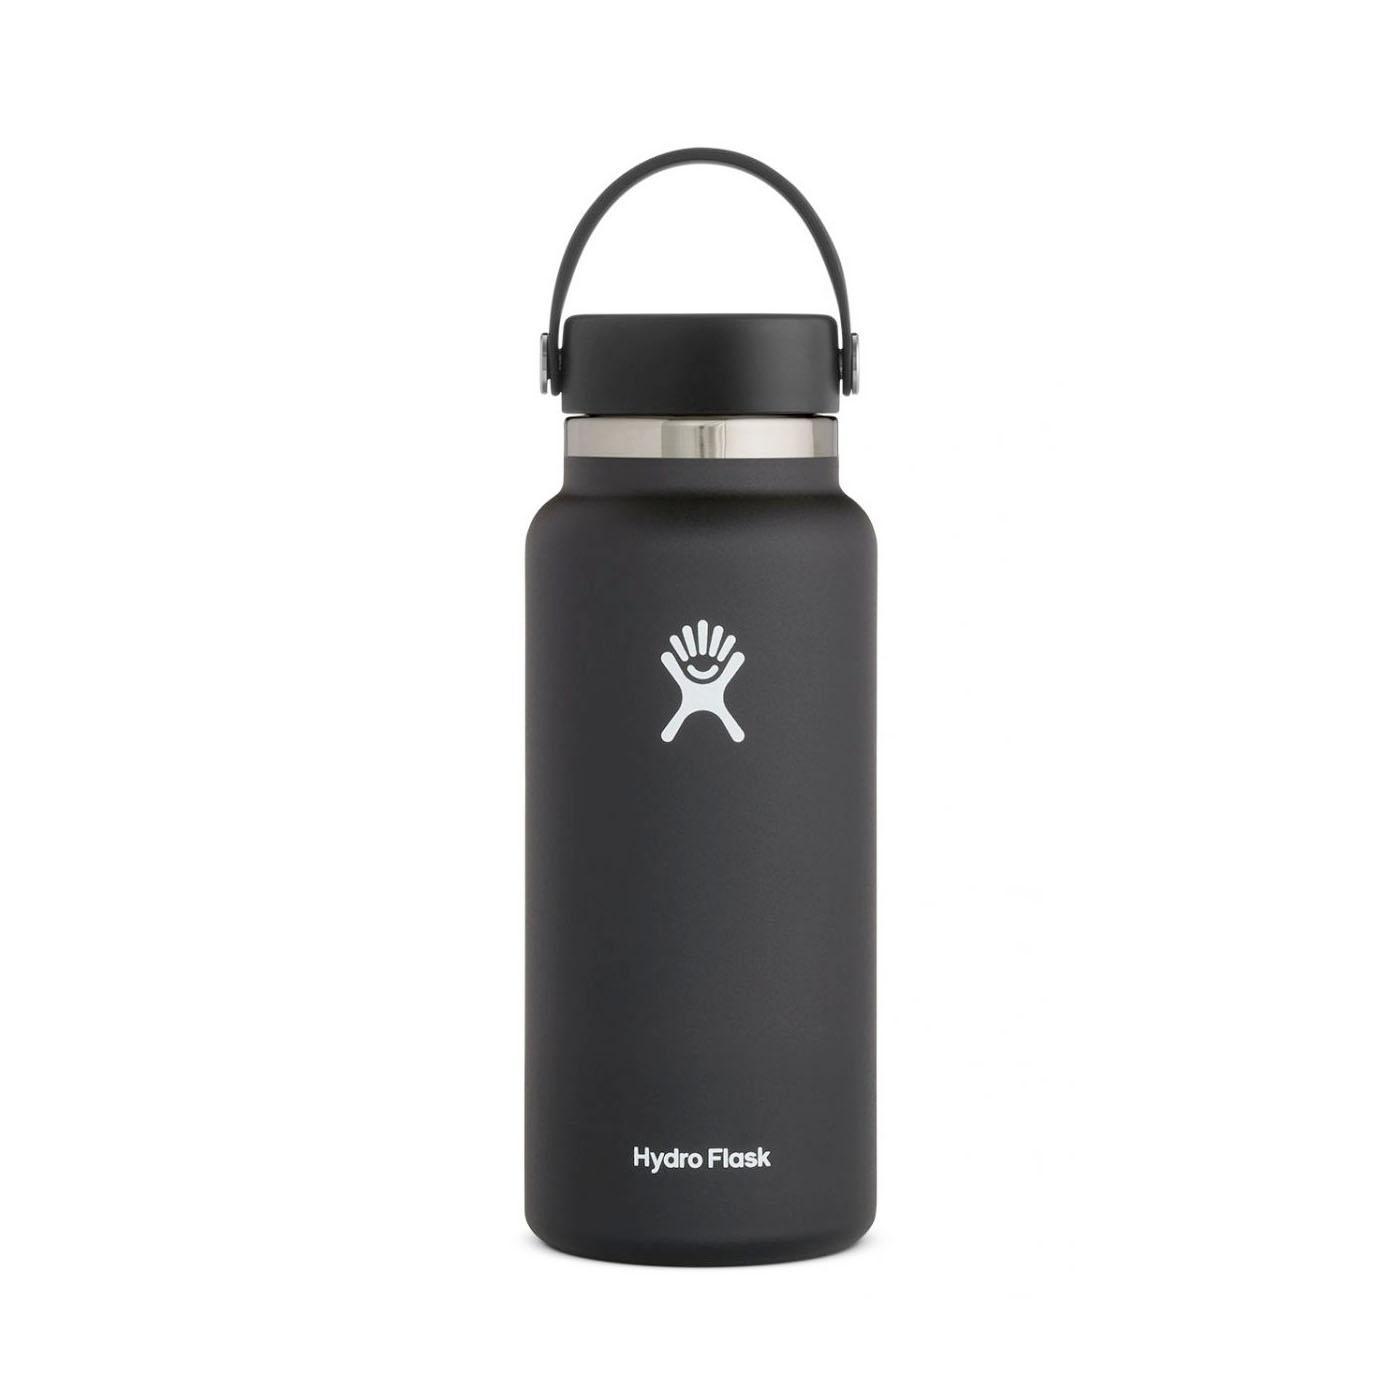 Hydro Flask Wide Mouth Water Bottle 32oz Black